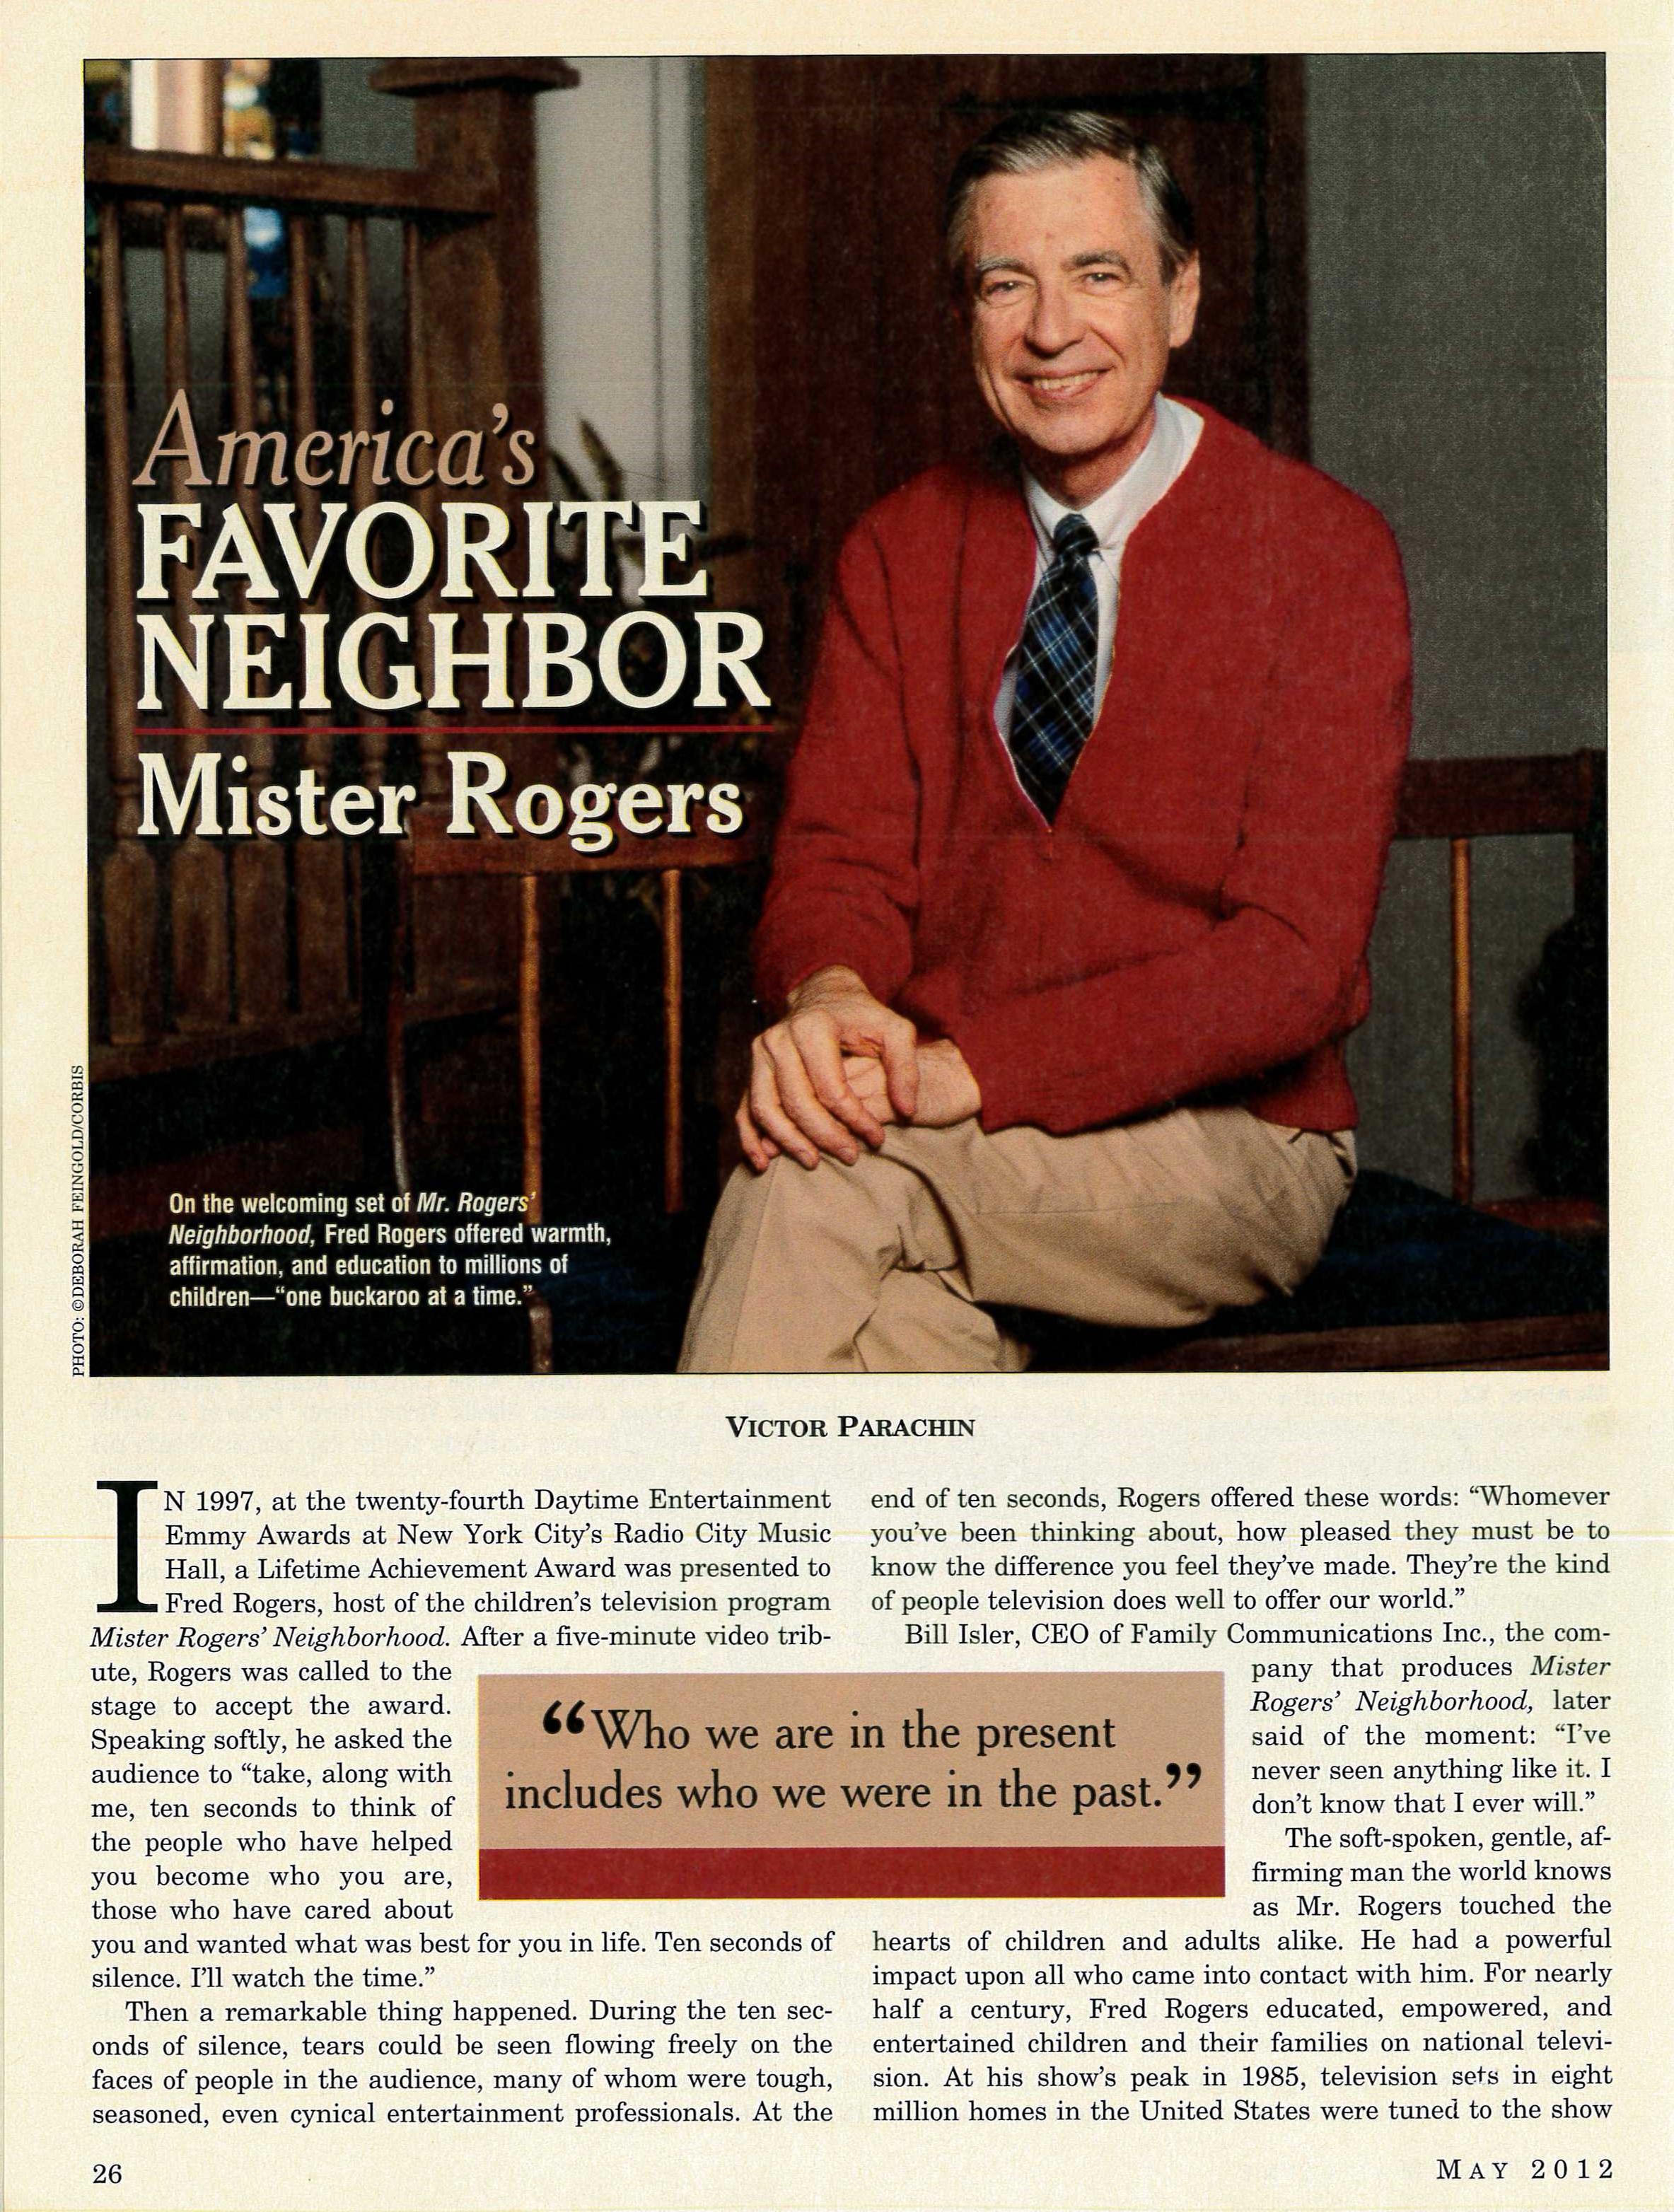 The Elks Magazine The Mister Rogers Neighborhood Archive